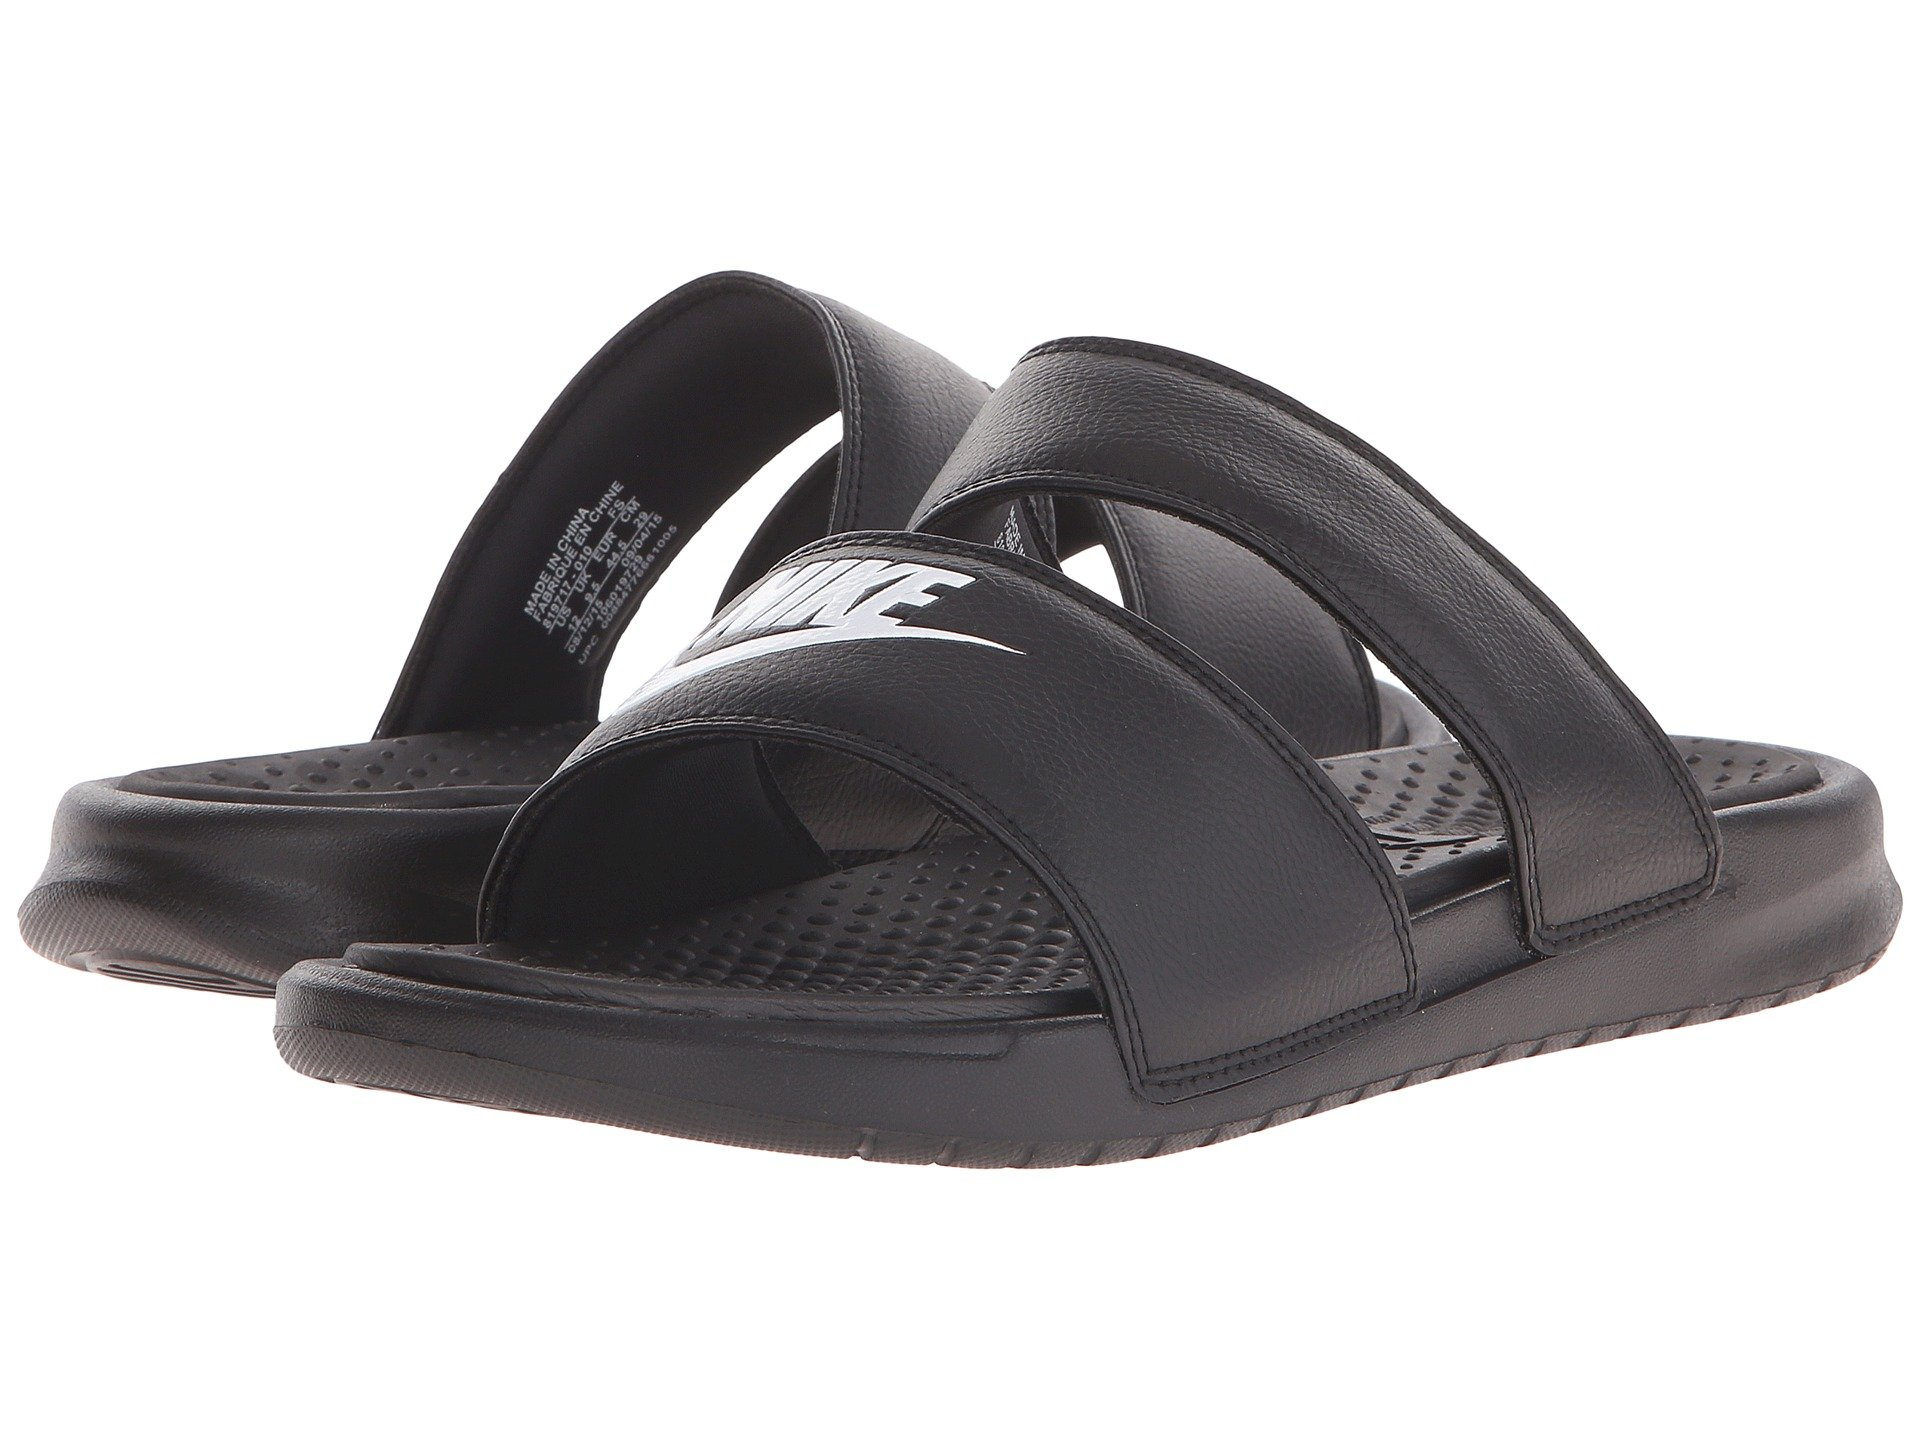 4d18769321 Women s Nike Sandals + FREE SHIPPING